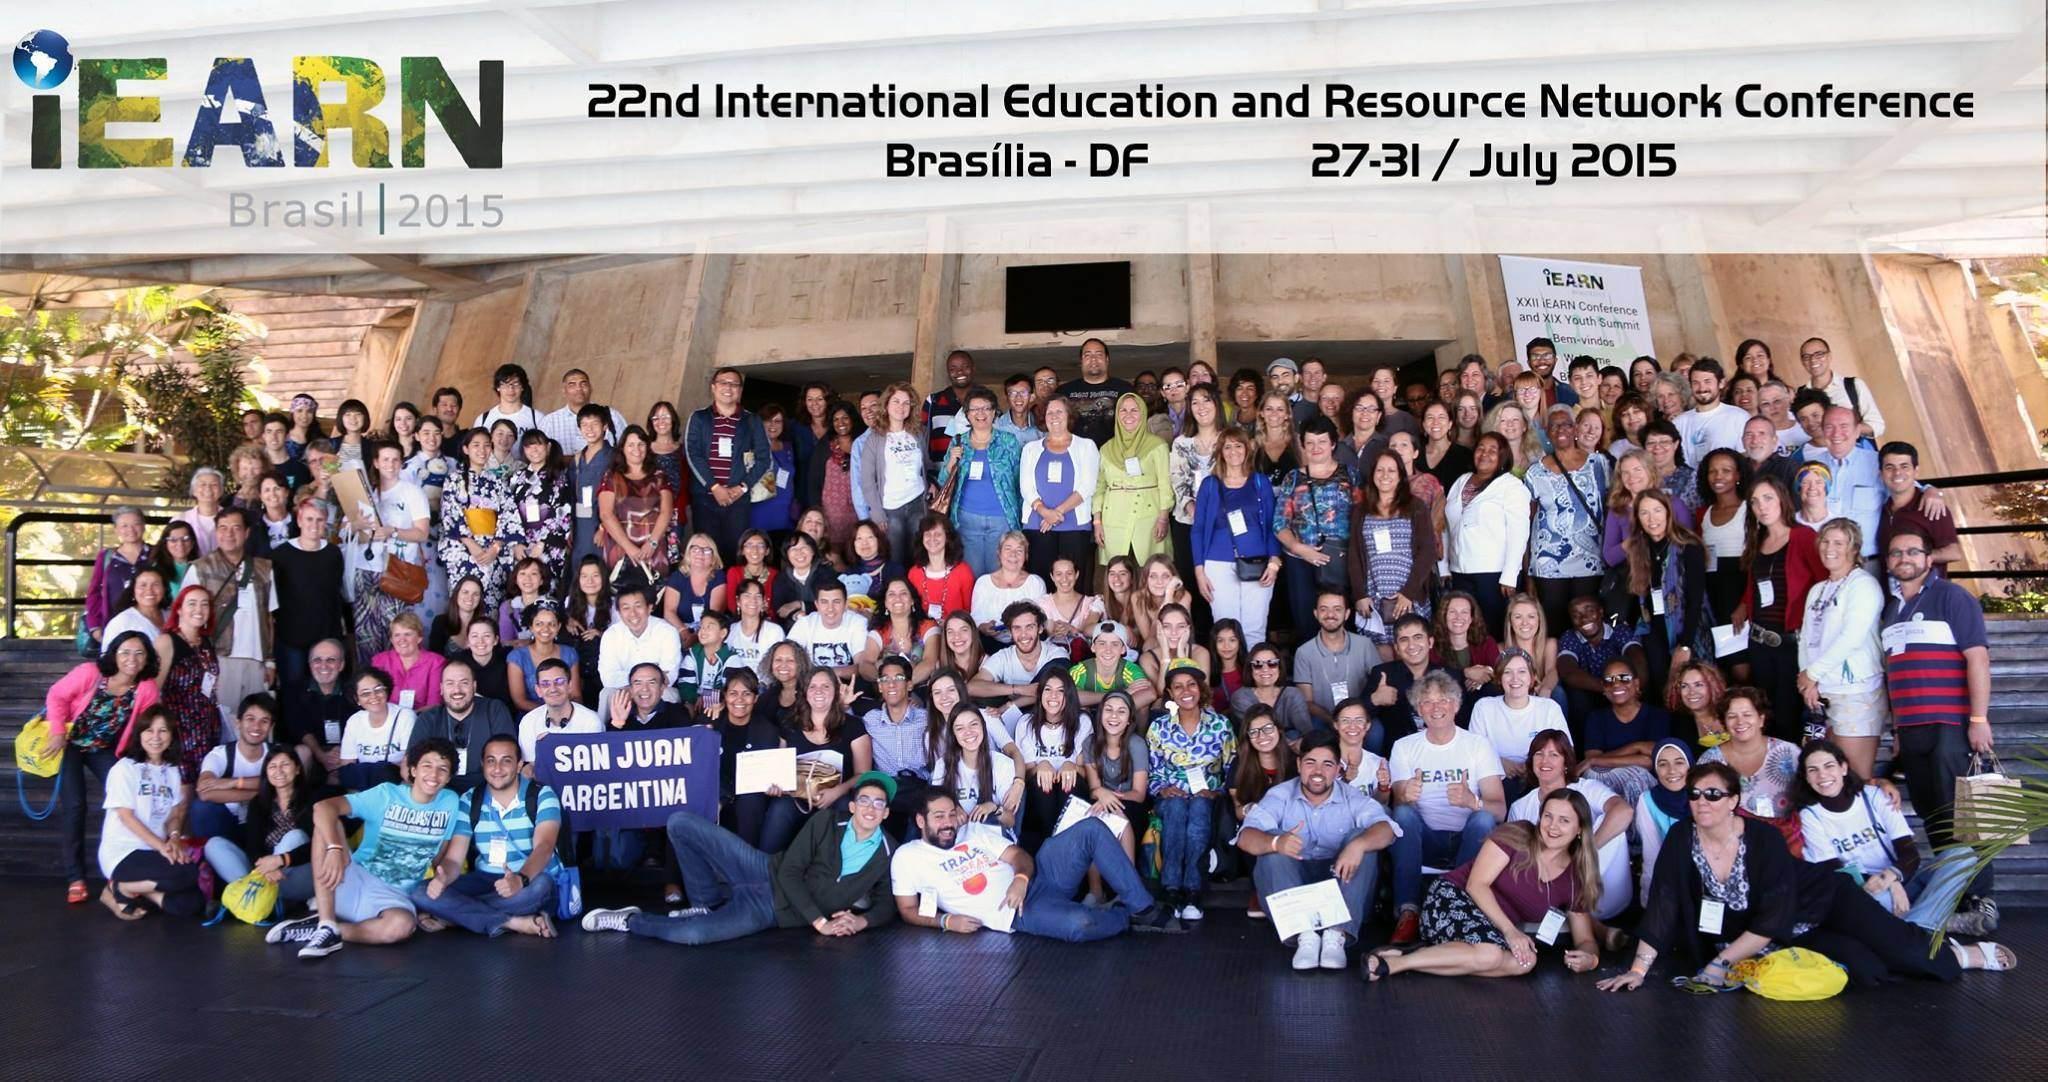 Conferência Internacional 2015 Brasília